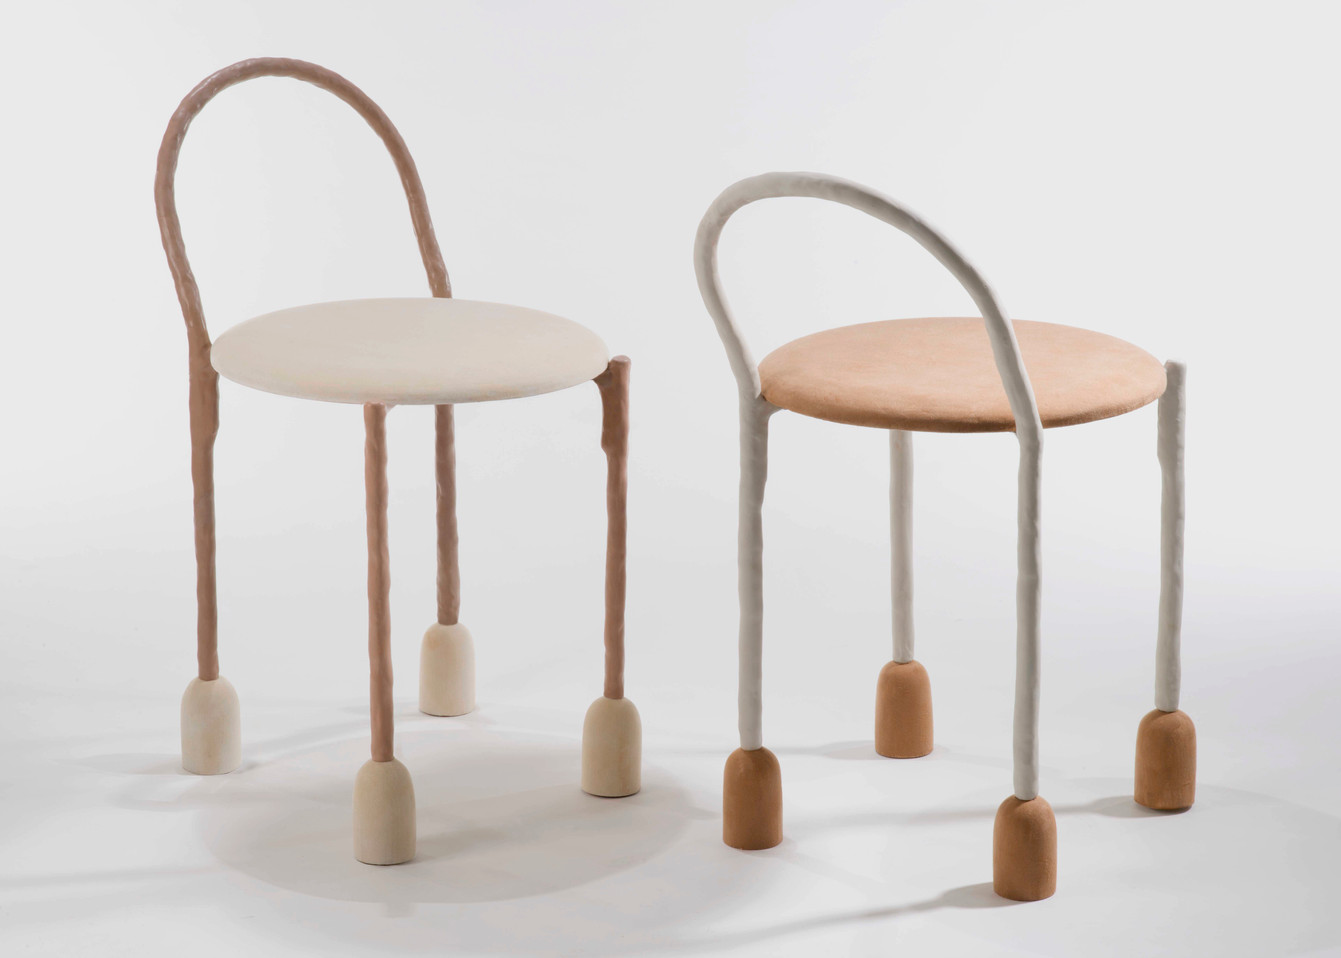 chair2 copy.jpg